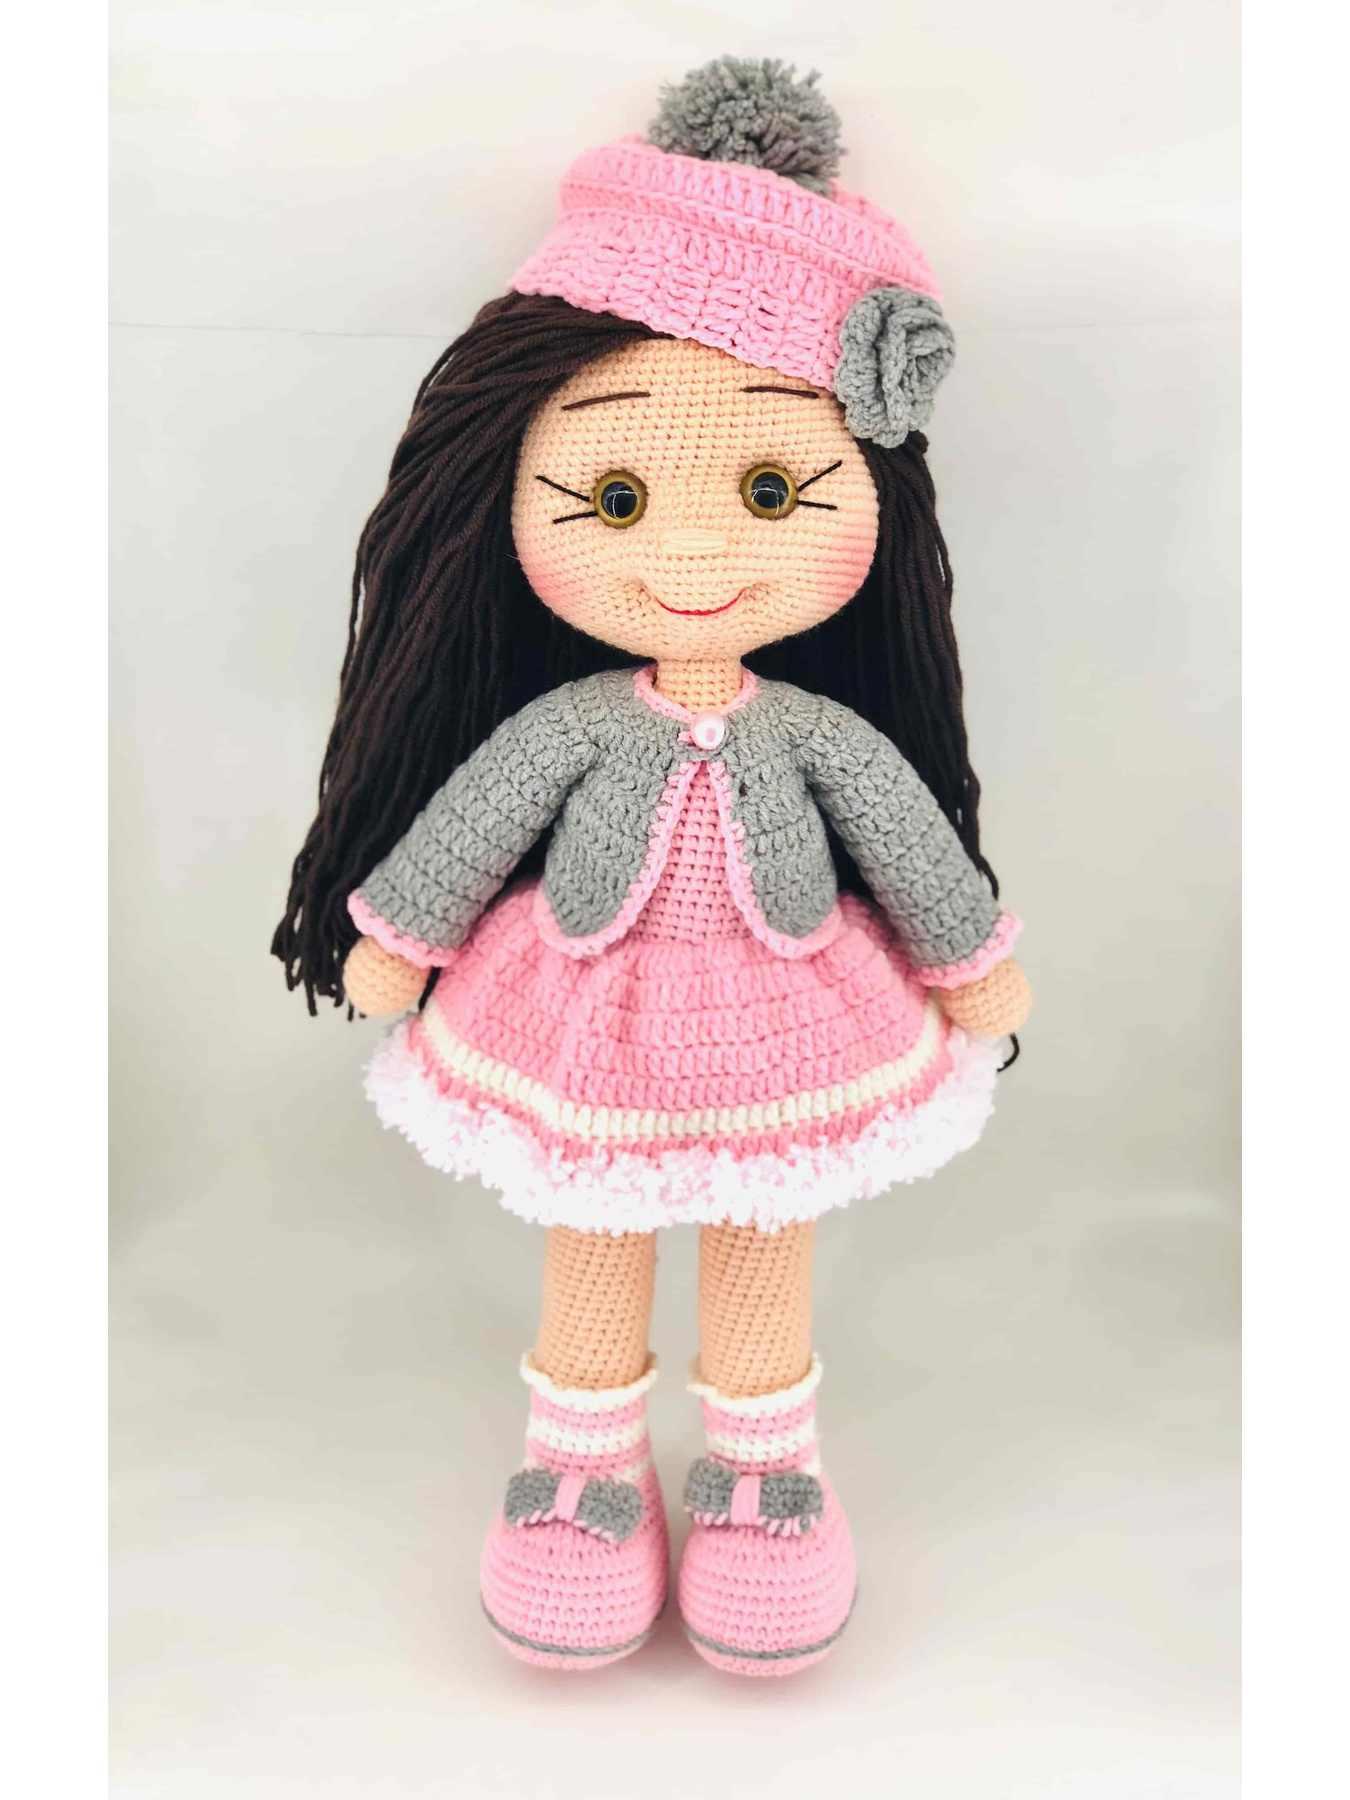 Amigurumi doll plushie | Etsy Handmade & Vintage Amino | 1800x1350